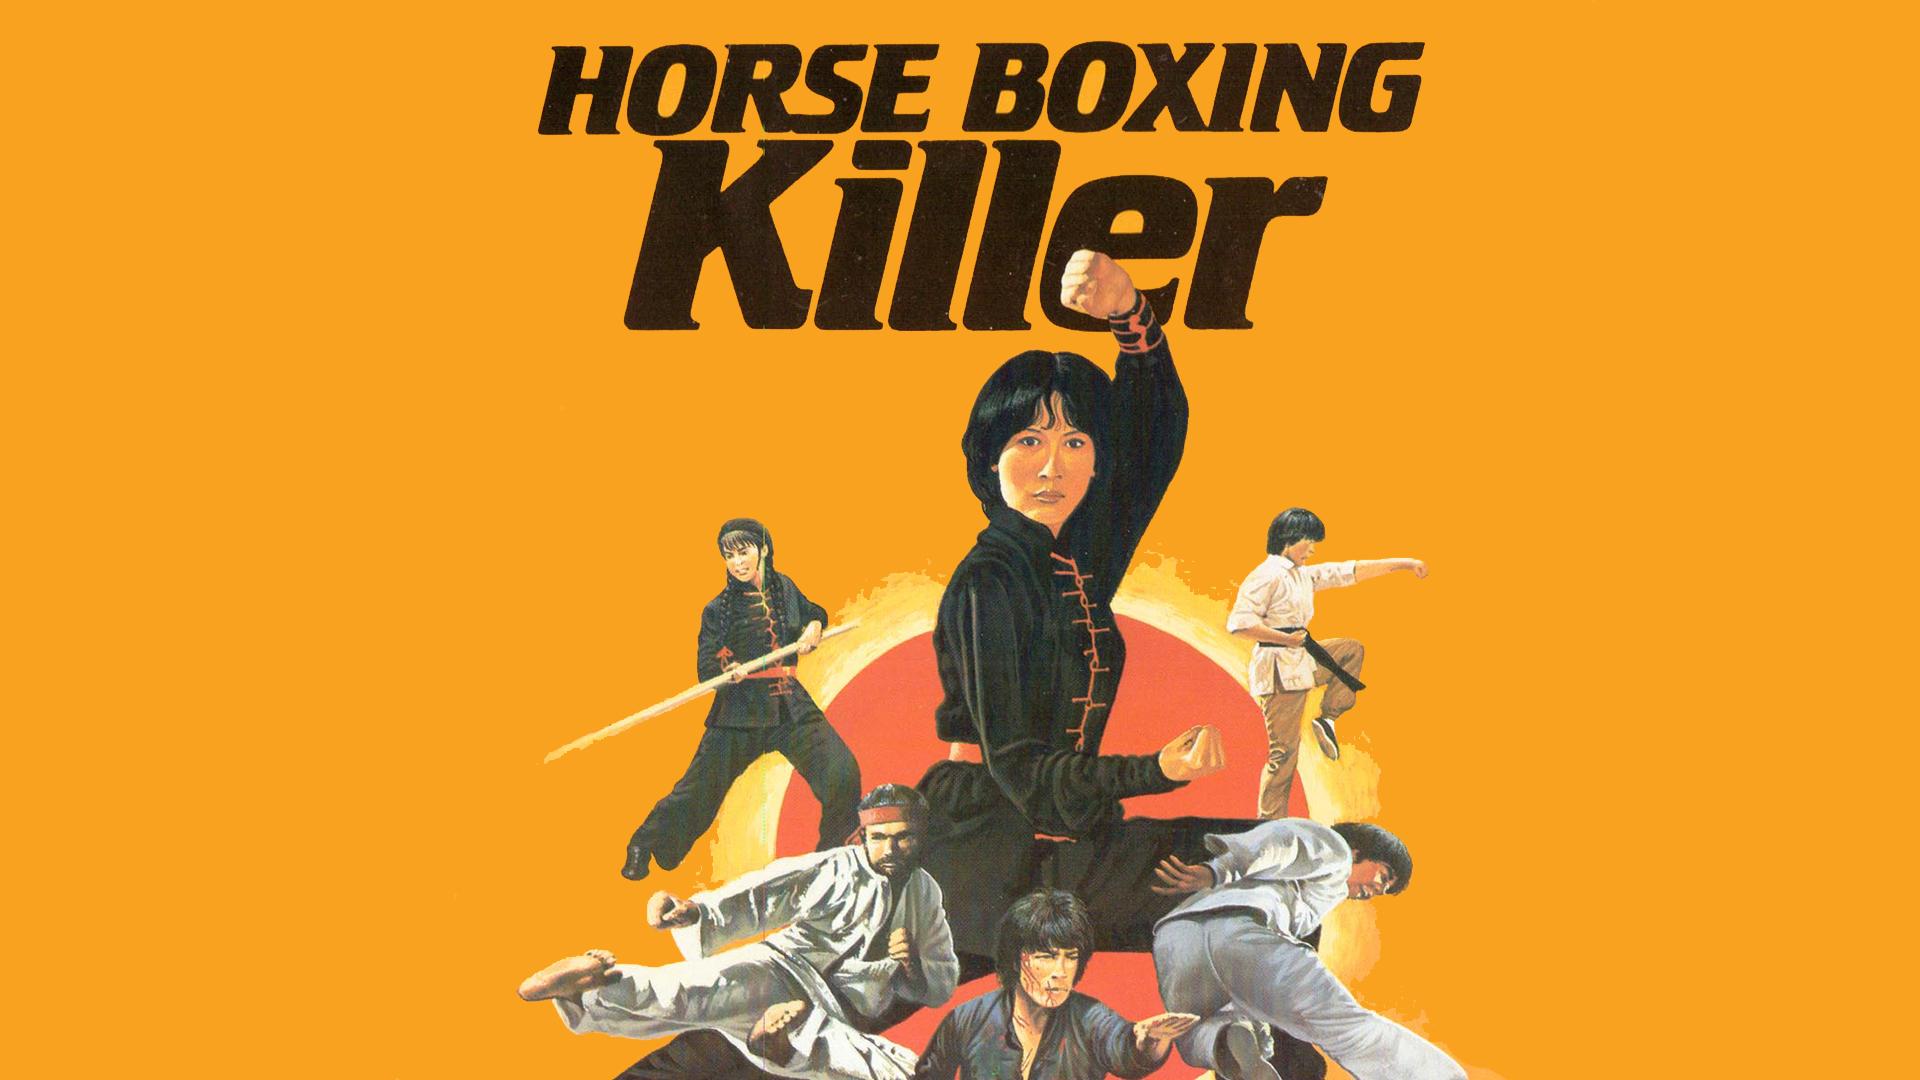 Horse Boxing Killer